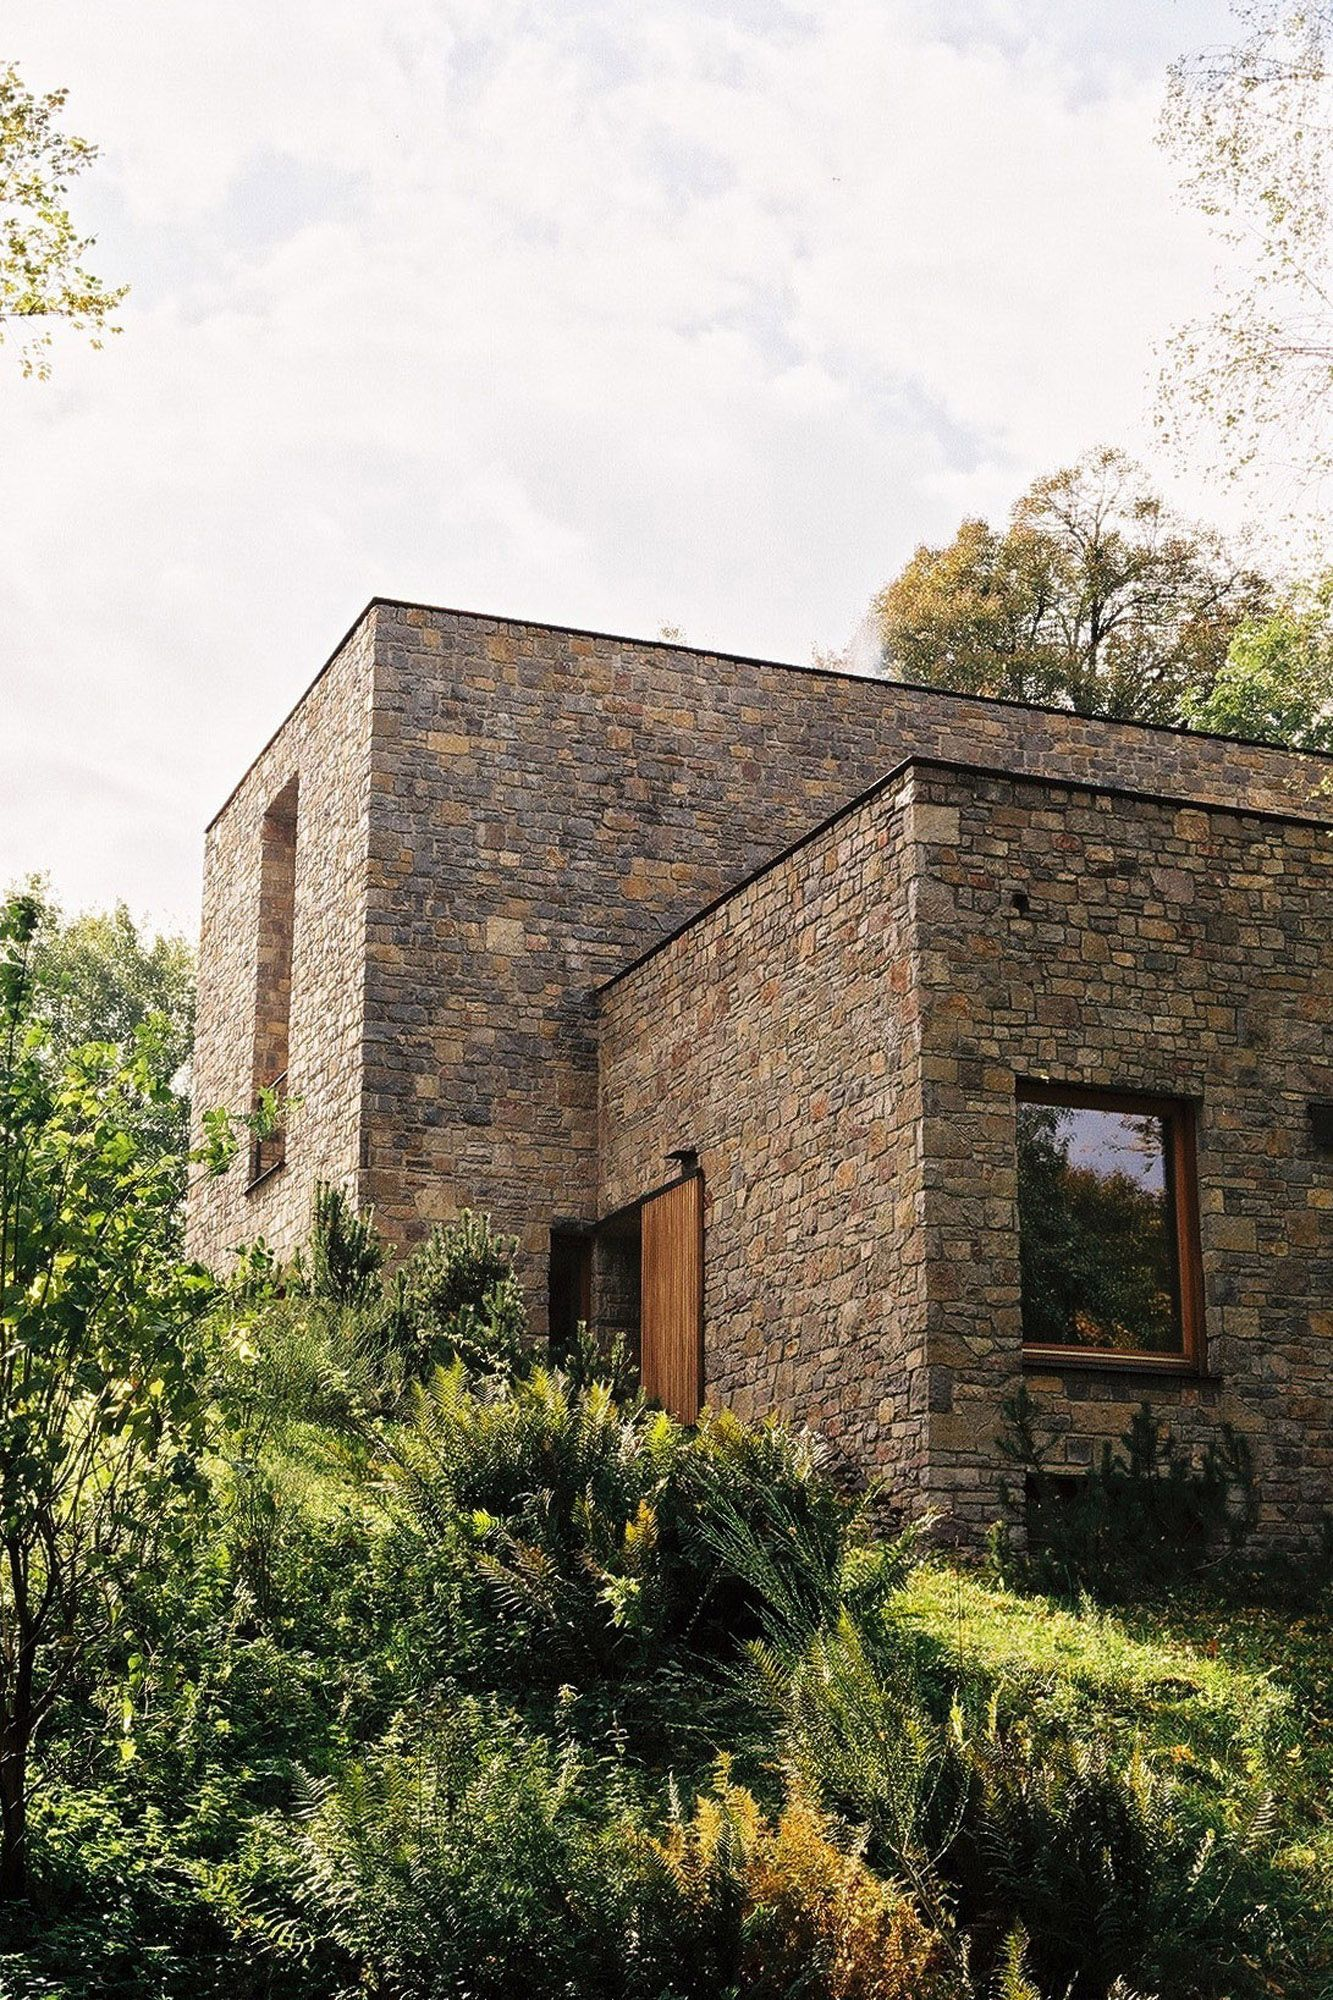 PLACES Wygnanowice House Over Crystal Clear Springs SpringCrystalsMinimal ArchitectureOrganic